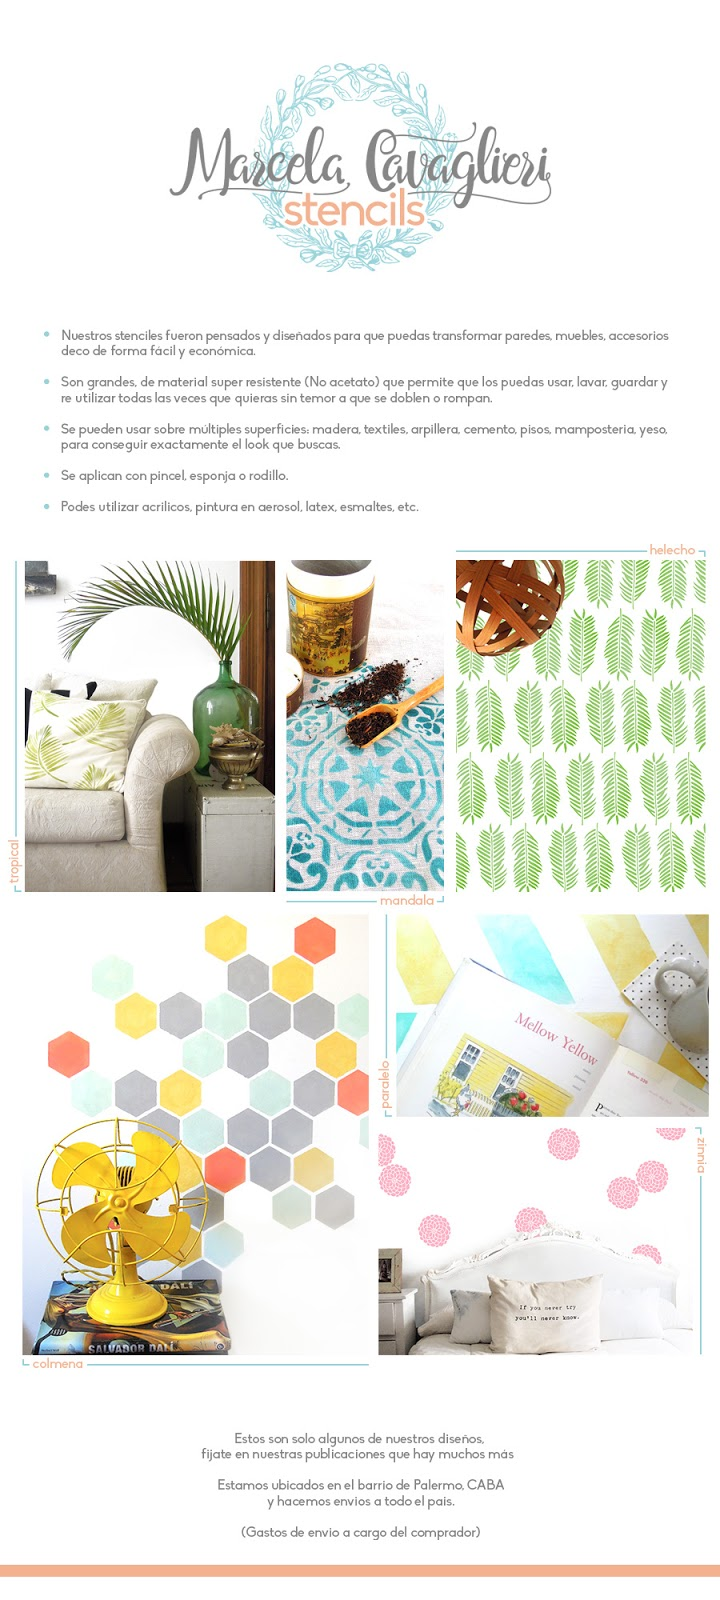 stencils, deco, muebles, paredes, mandala, pintura